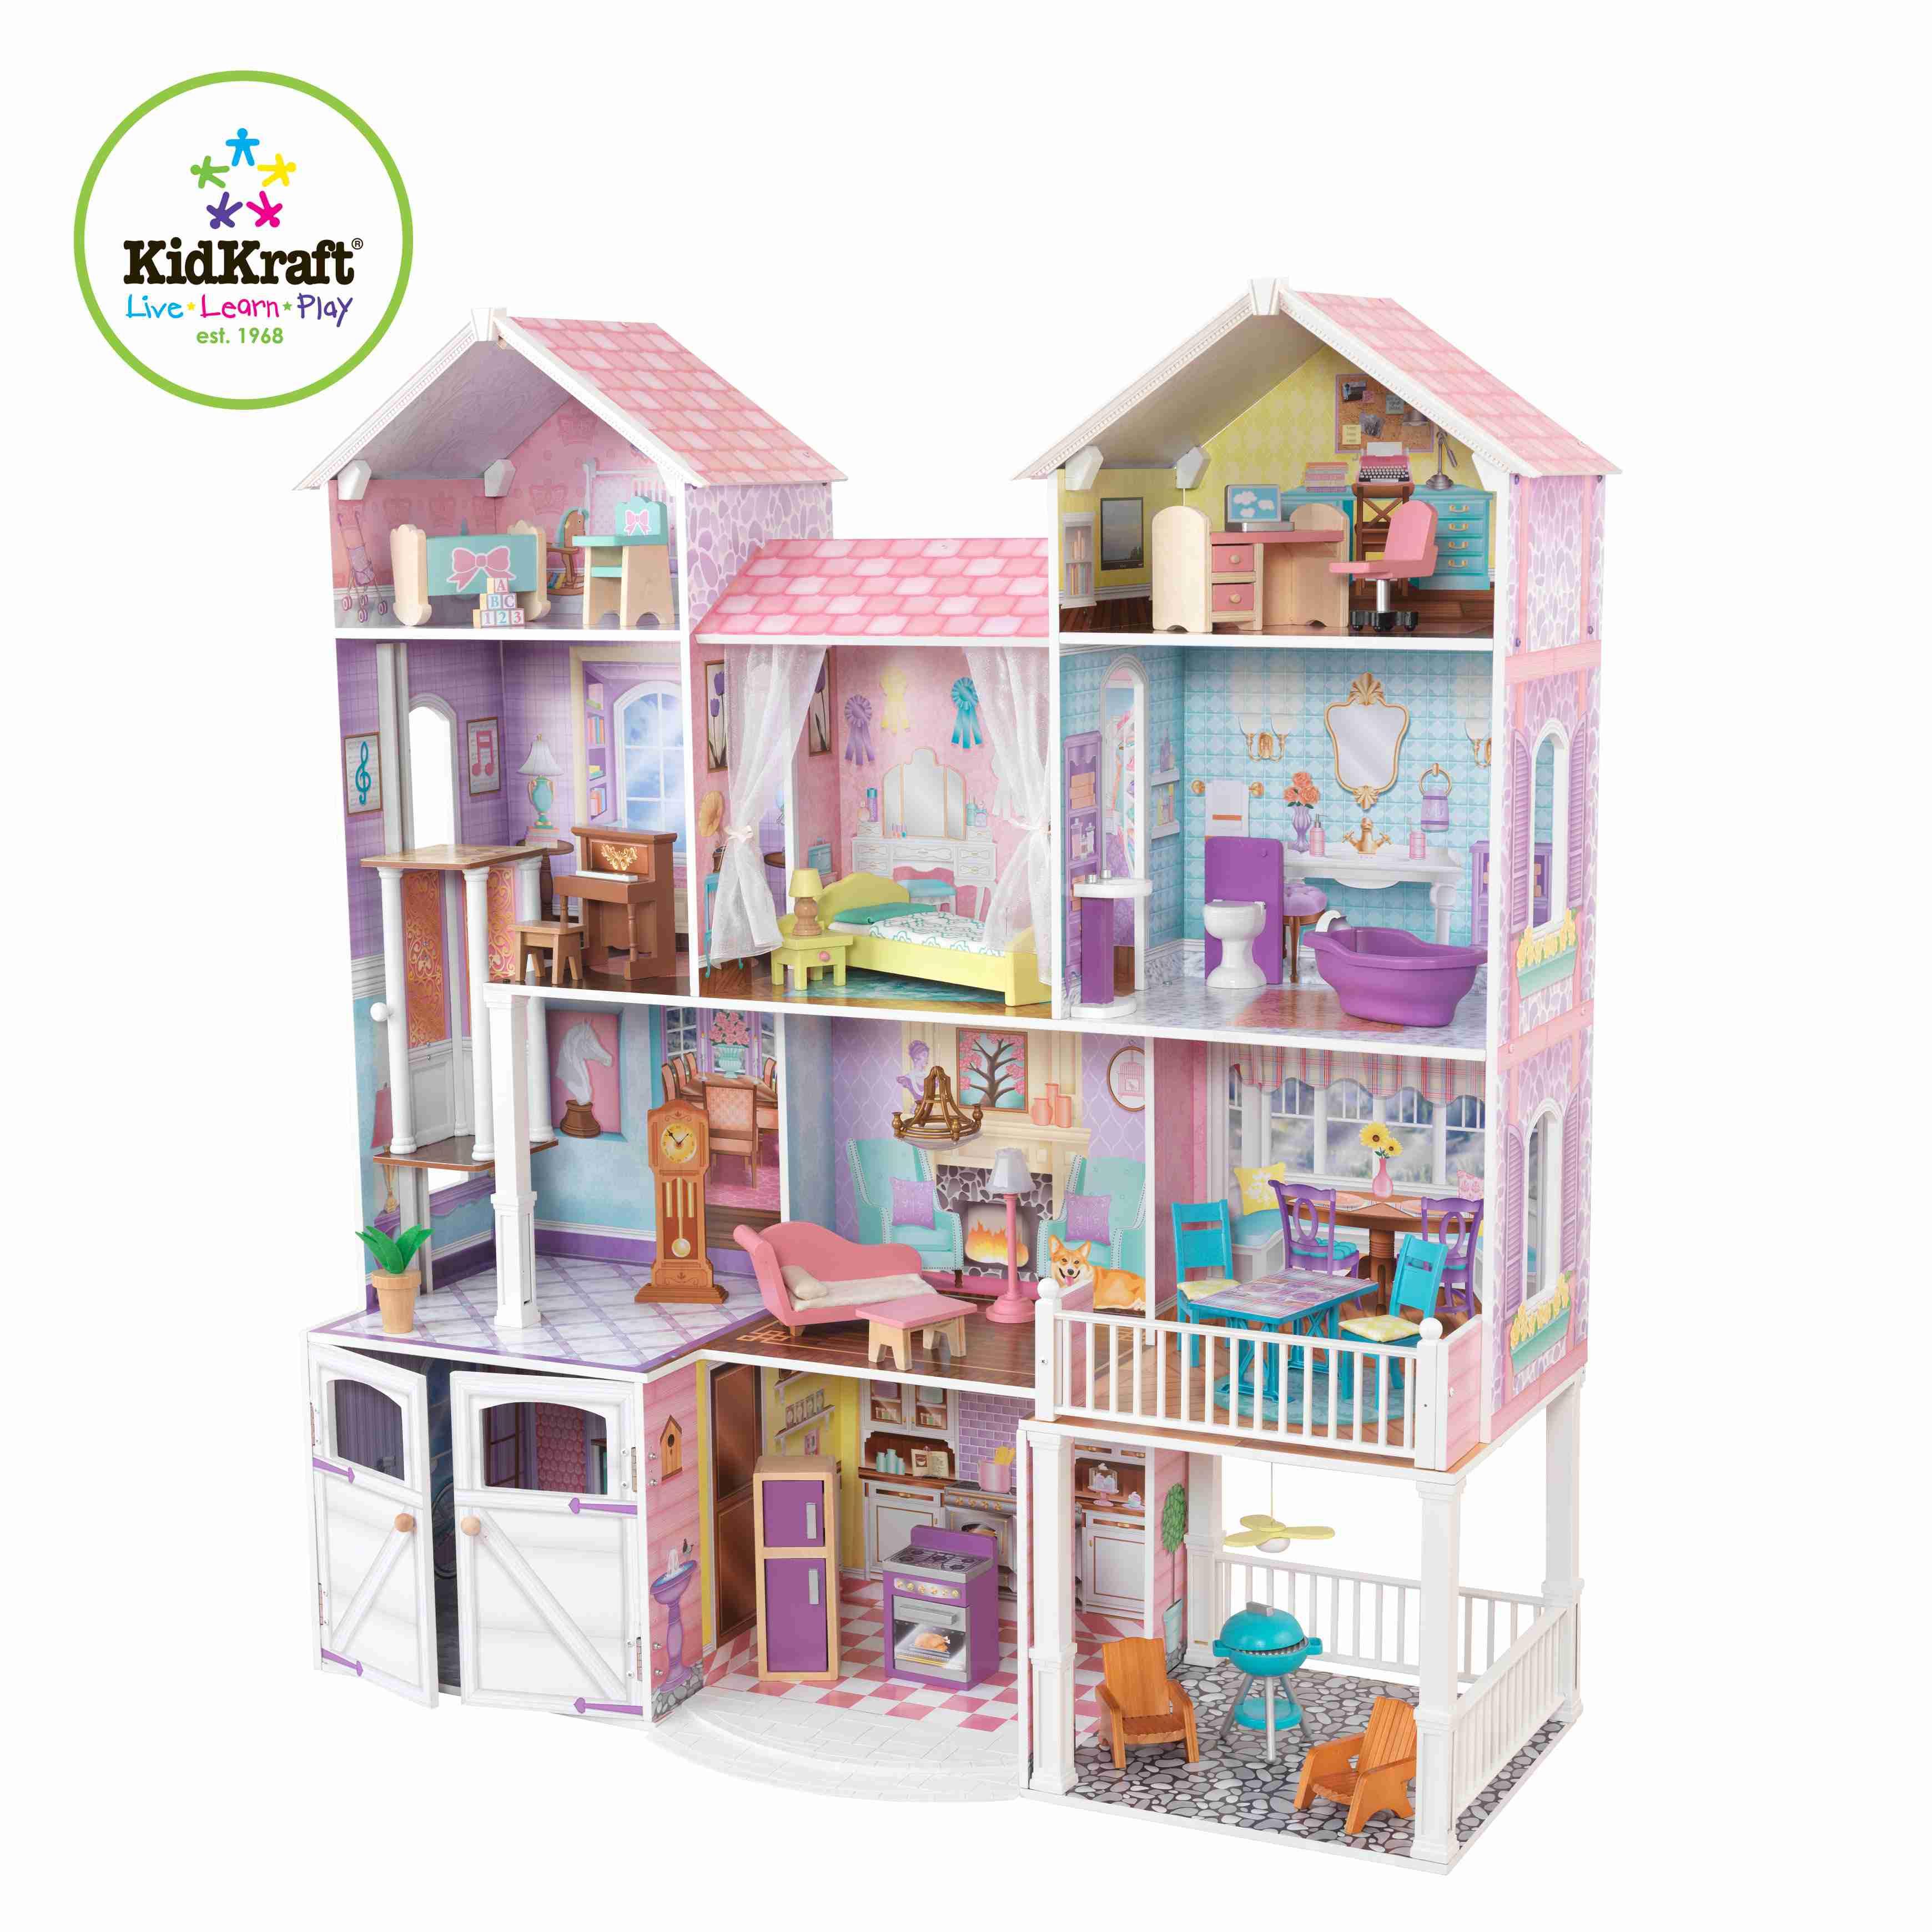 Kidkraft Country Estate Doll's House